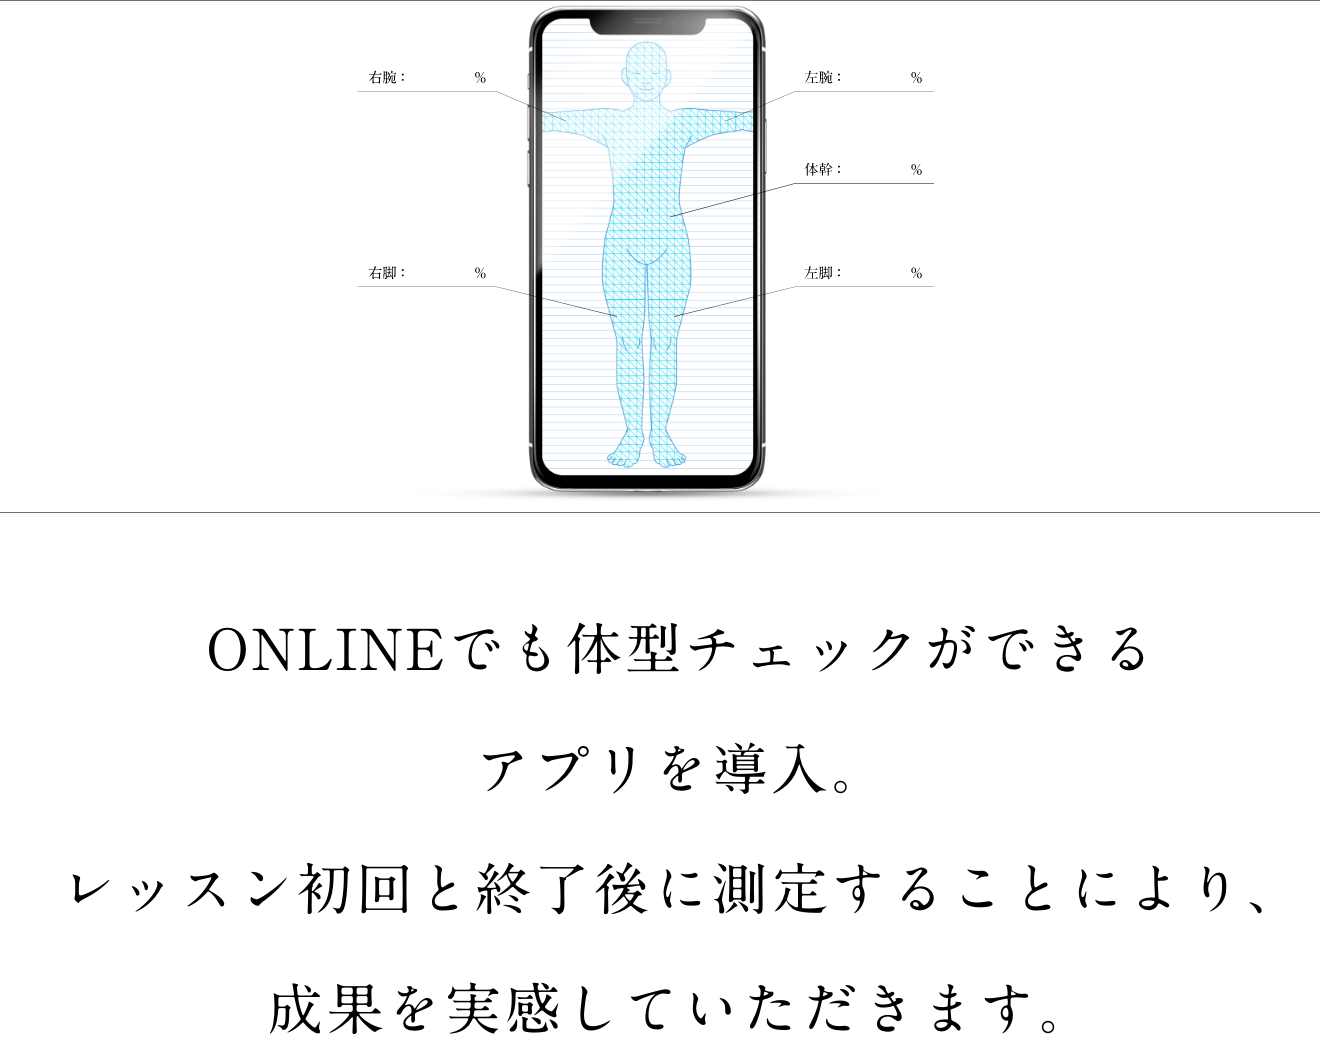 ONLINEでも体型チェックができるアプリを導入。 レッスン初回と終了後に測定することにより、成果を実感していただきます。